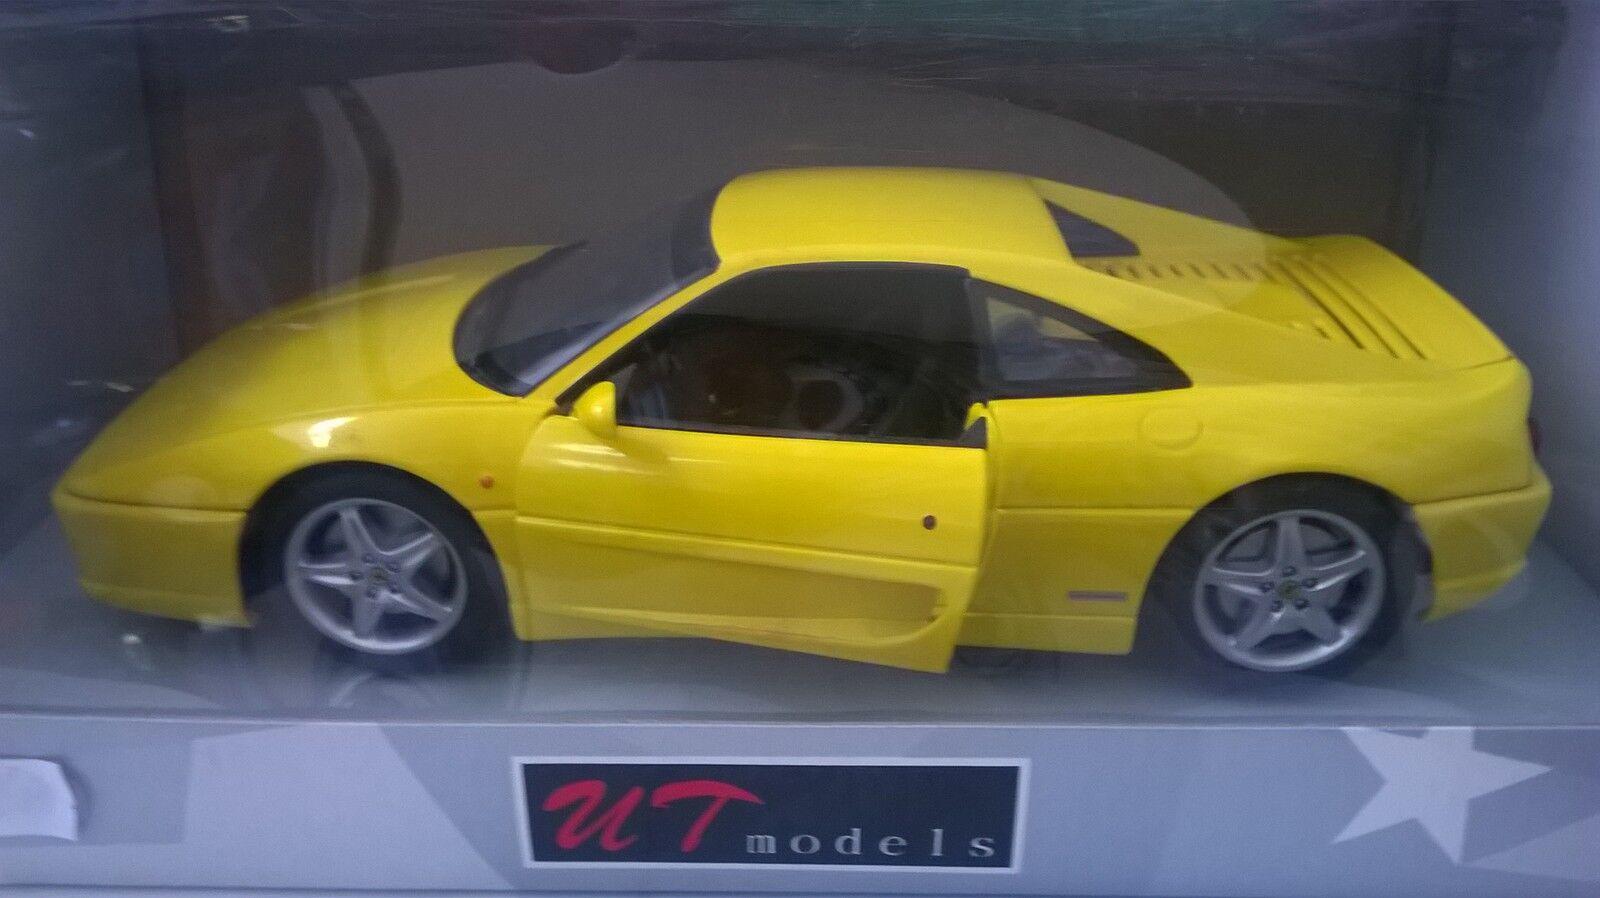 - 18 - modelle sterben mit metall ferrari f355 coupé 1994 gelb 074021